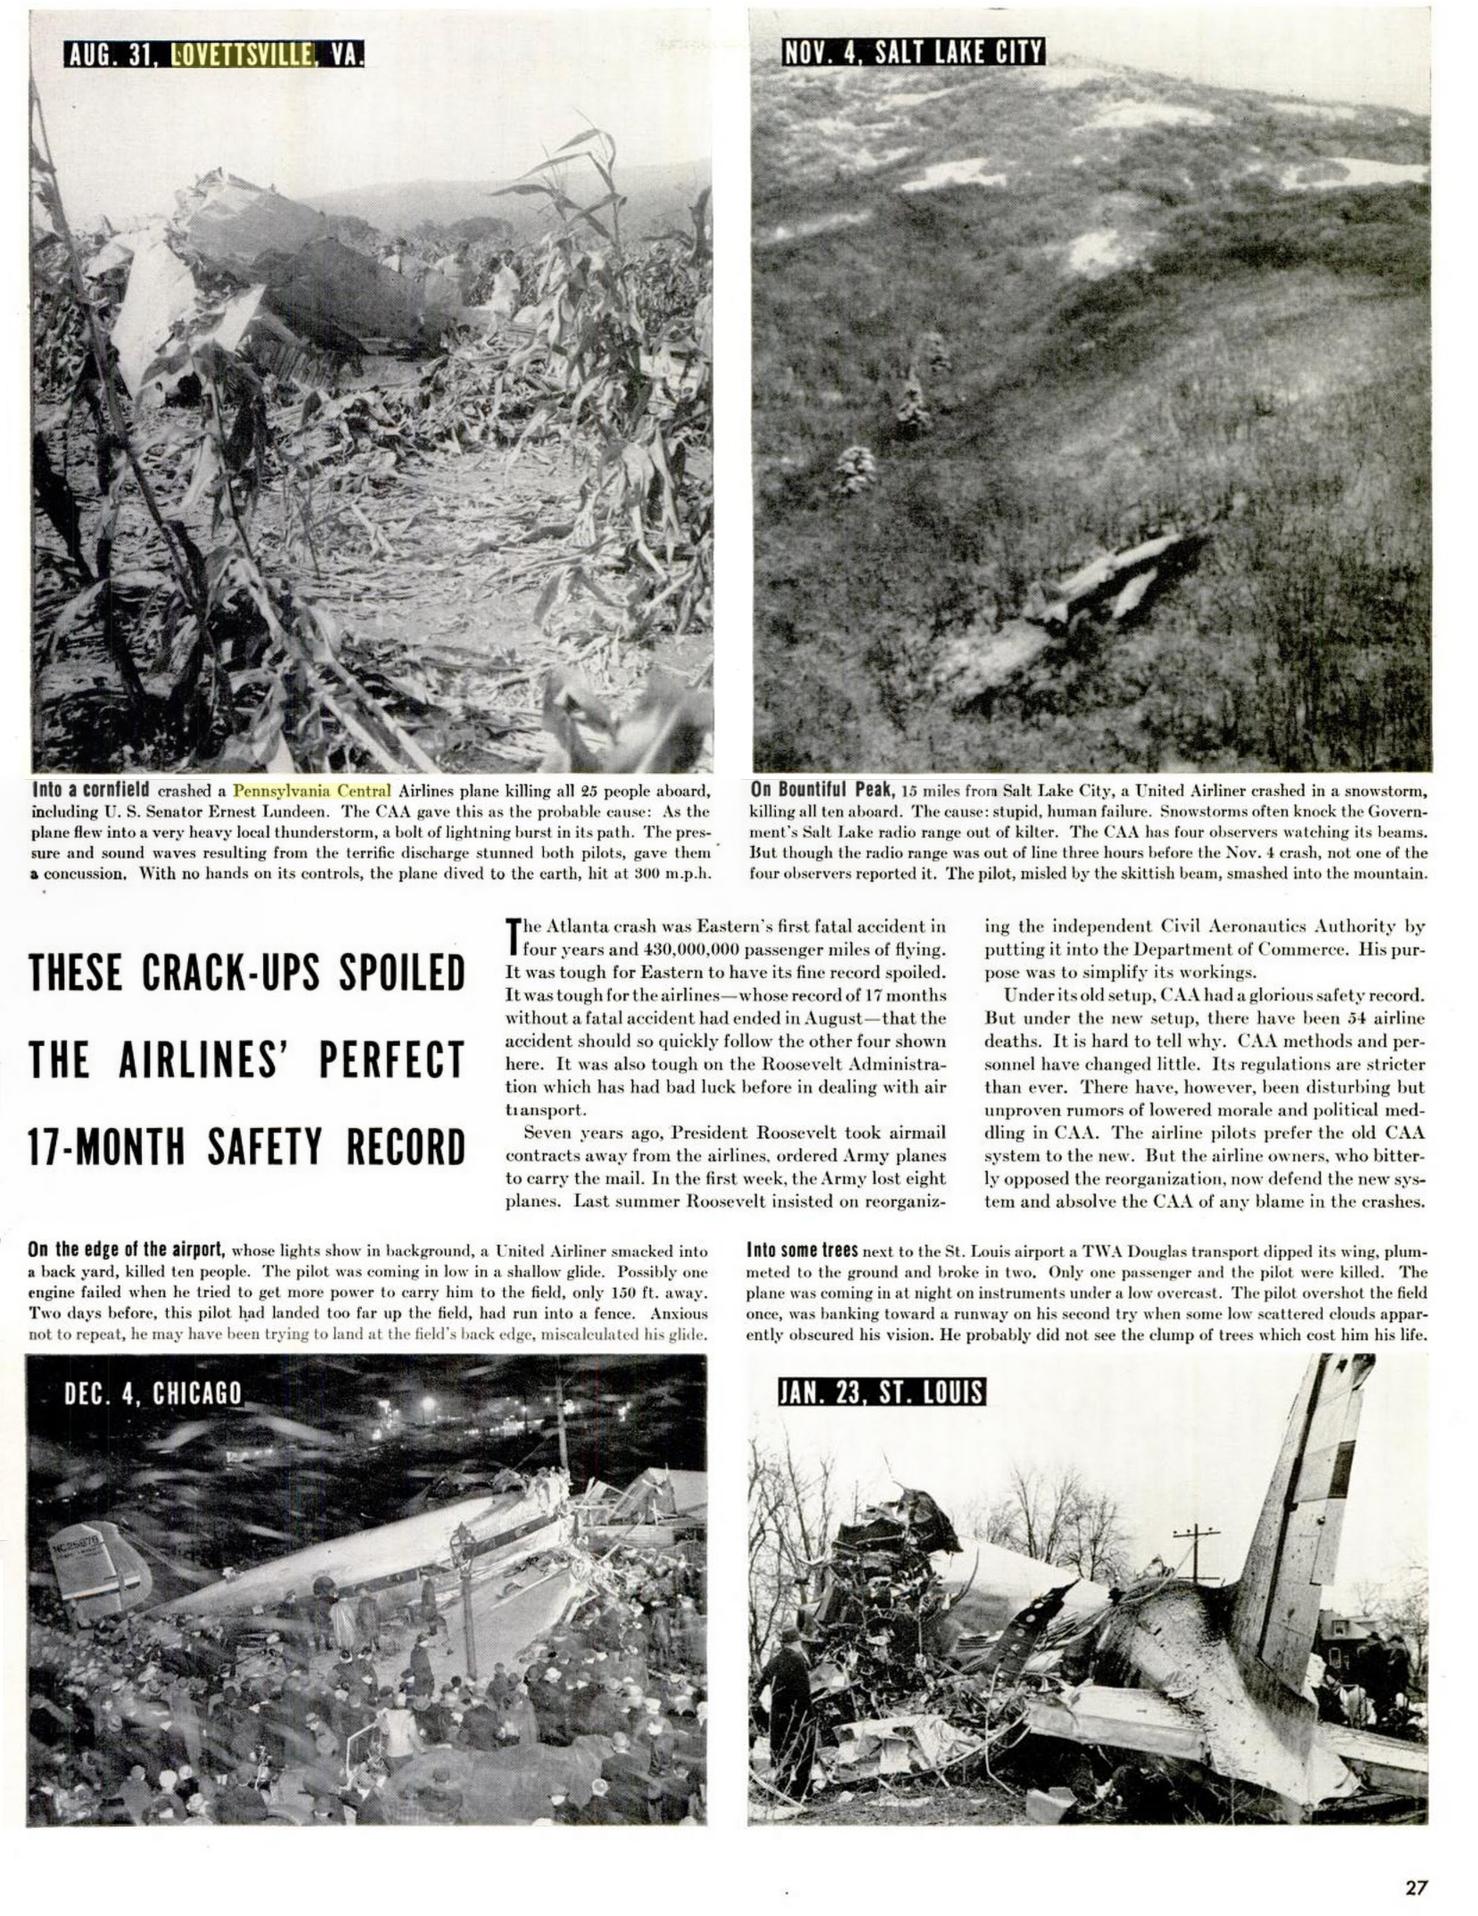 1941-03-10-life-magazine-page-27